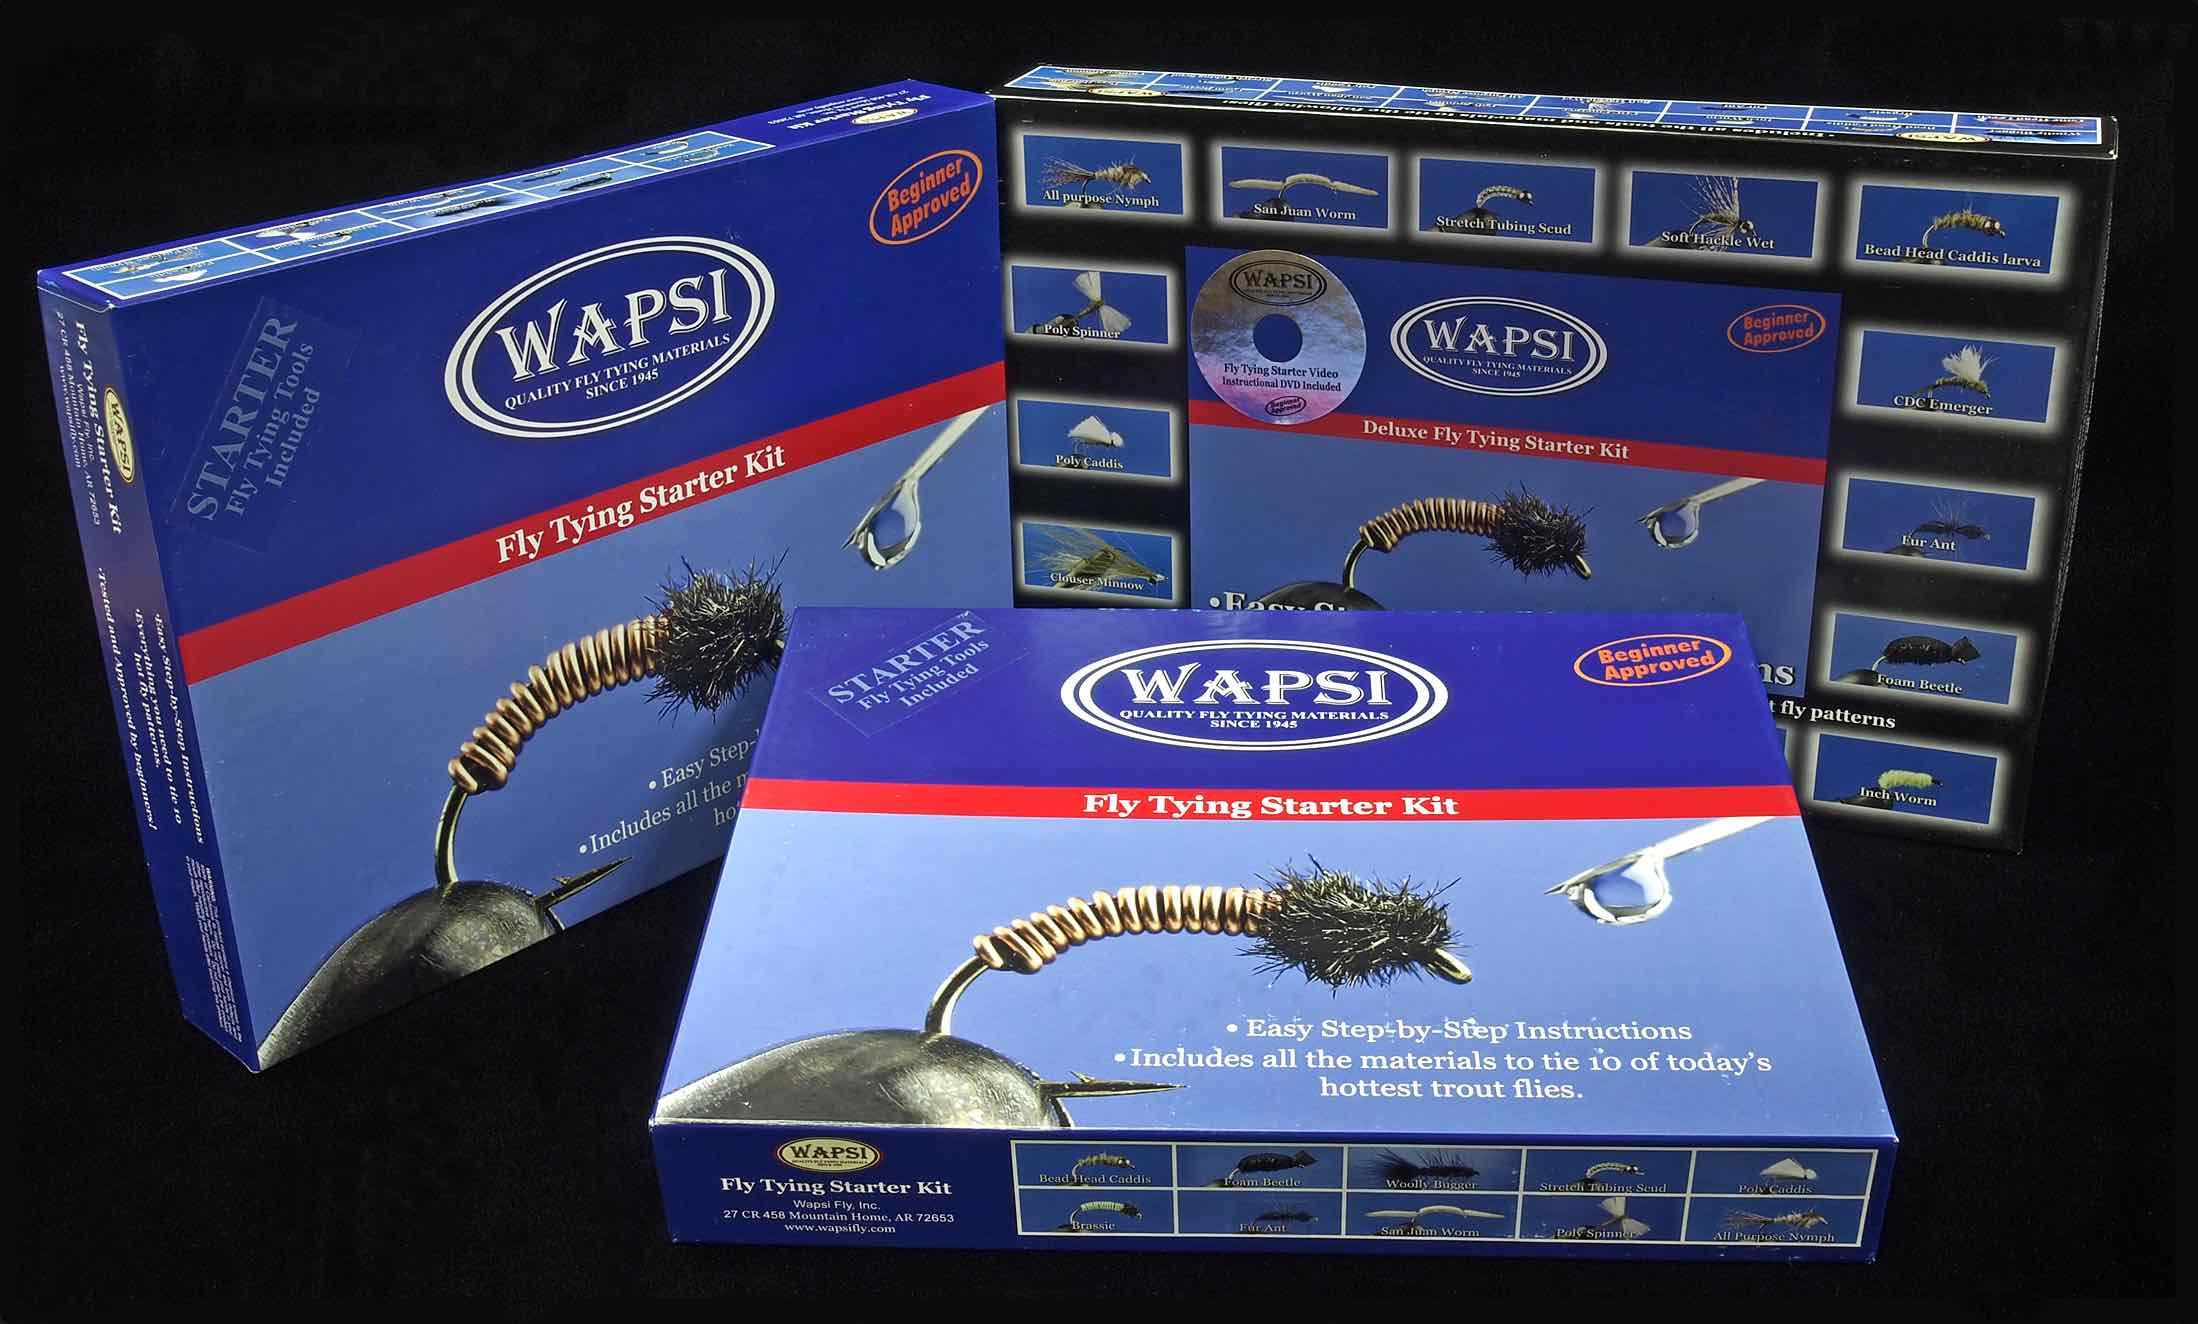 Beginner-Intermediate-Advanced-Wapsi-Fly-Tying-Kits-